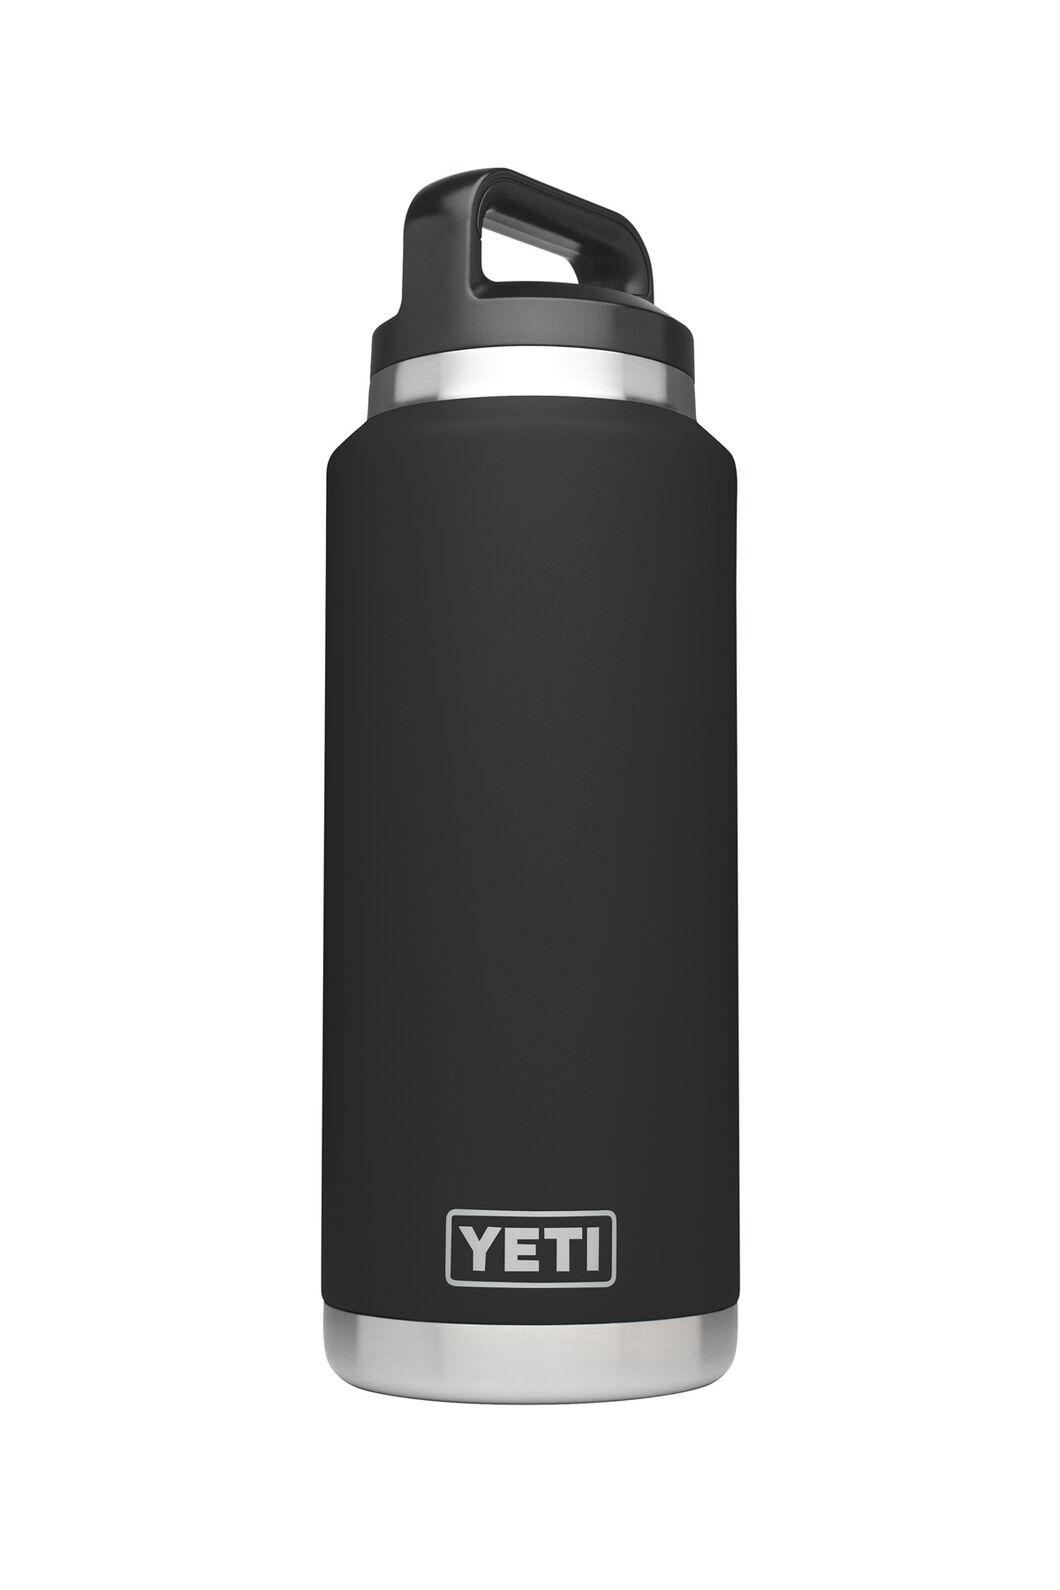 Yeti Rambler Drink Bottle Stainless Steel 36oz, Black, hi-res